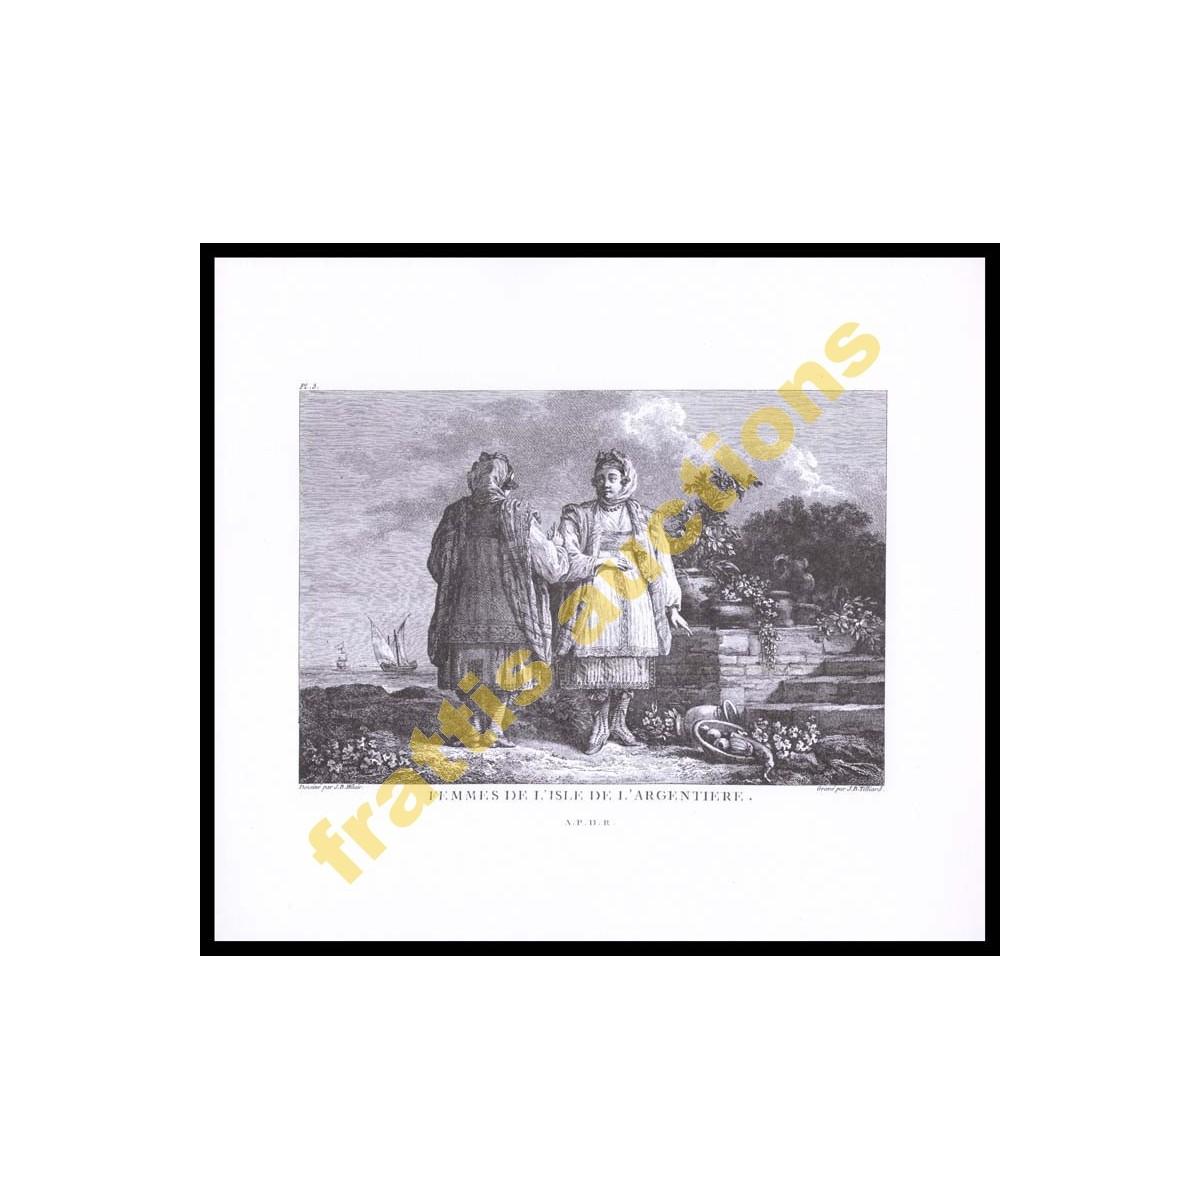 Eκτύπωση Χαρακτικού του J.B.Tilliard Γυναίκες της Κιμώλου.